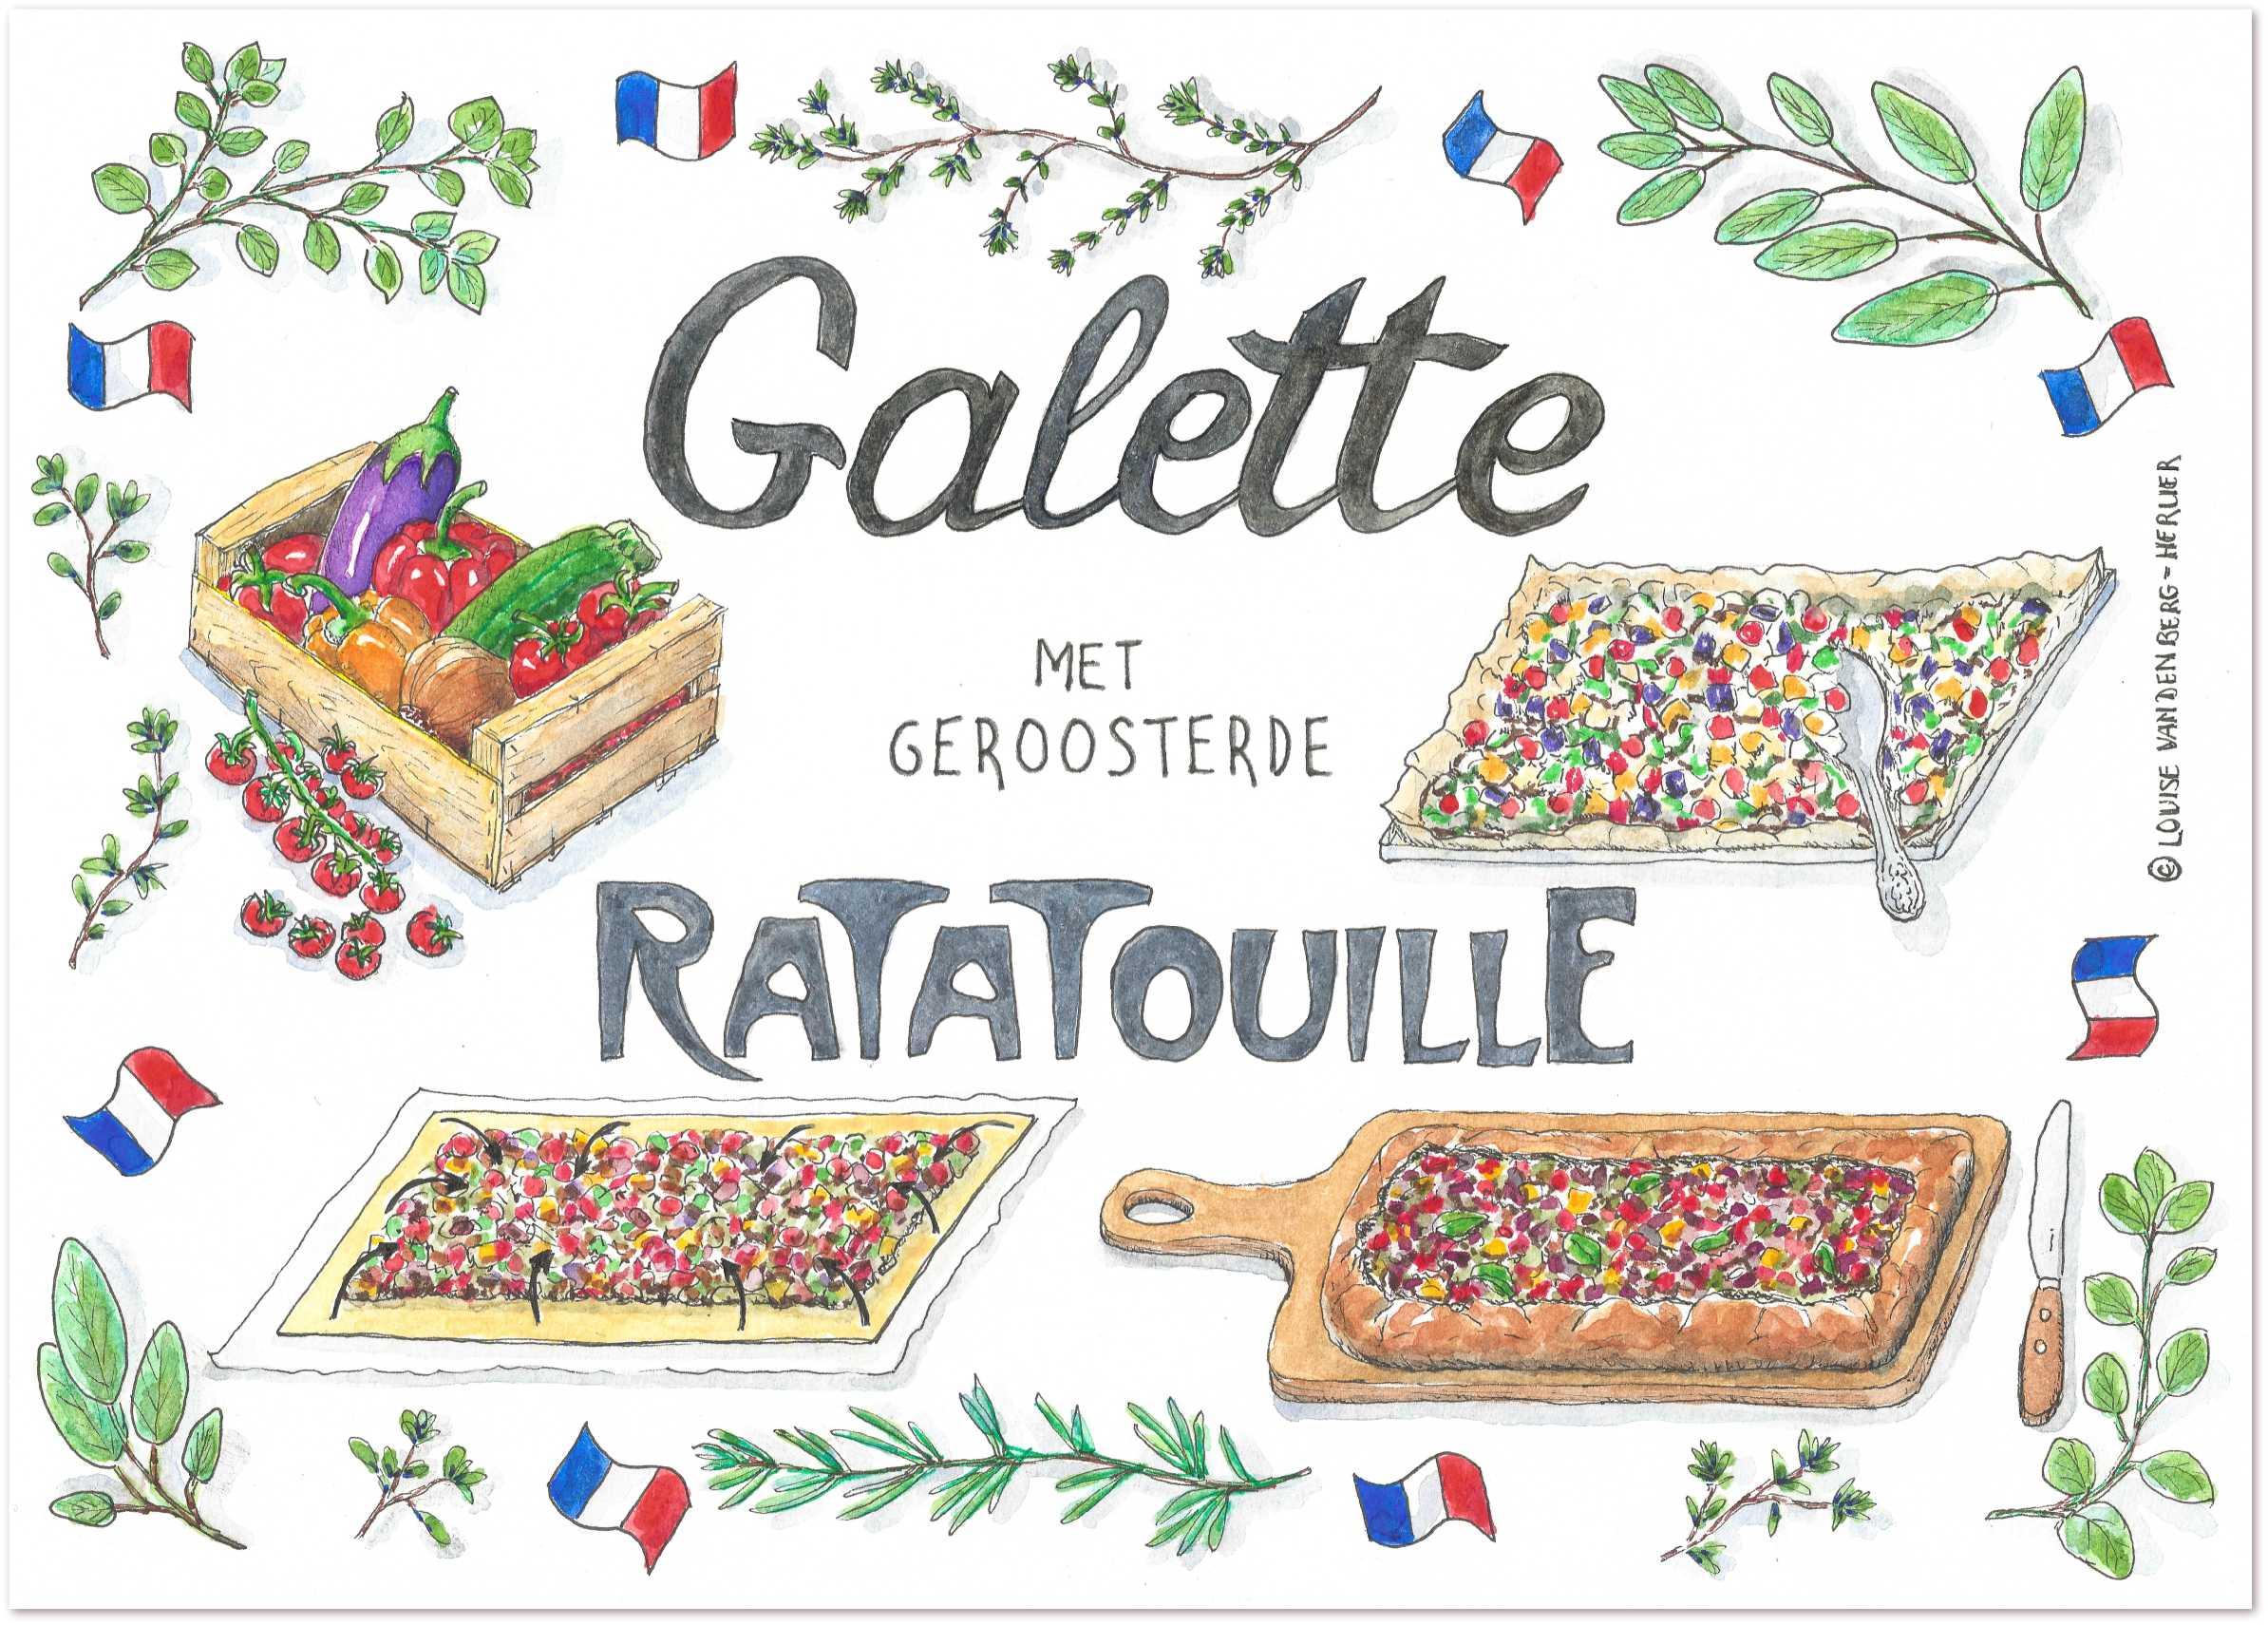 illustratie galette met ratatouille | KeukenAtelier